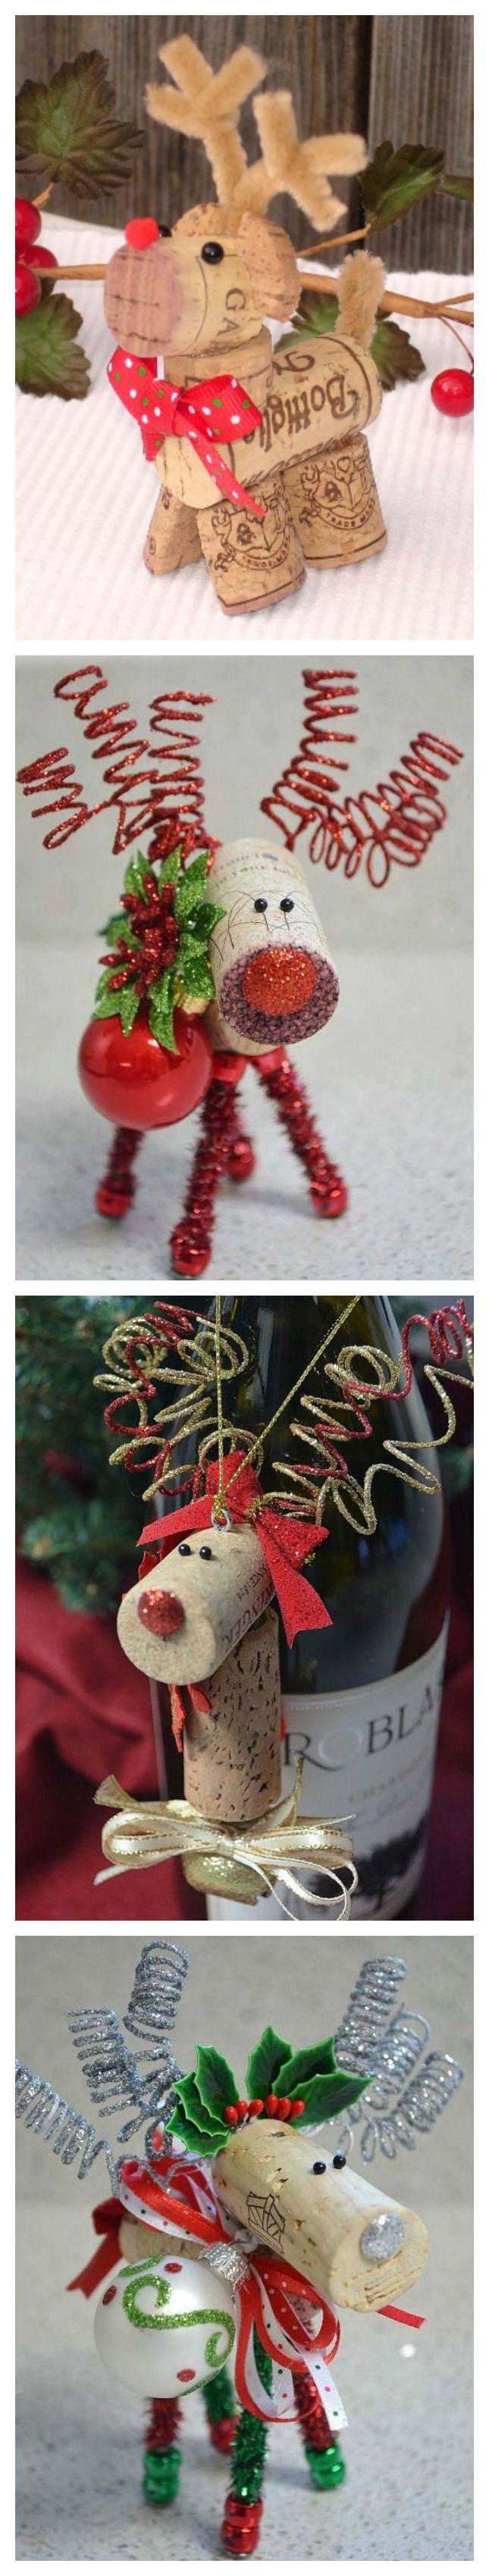 Mrs potts chip christmas decoration - 17 Epic Christmas Craft Ideas